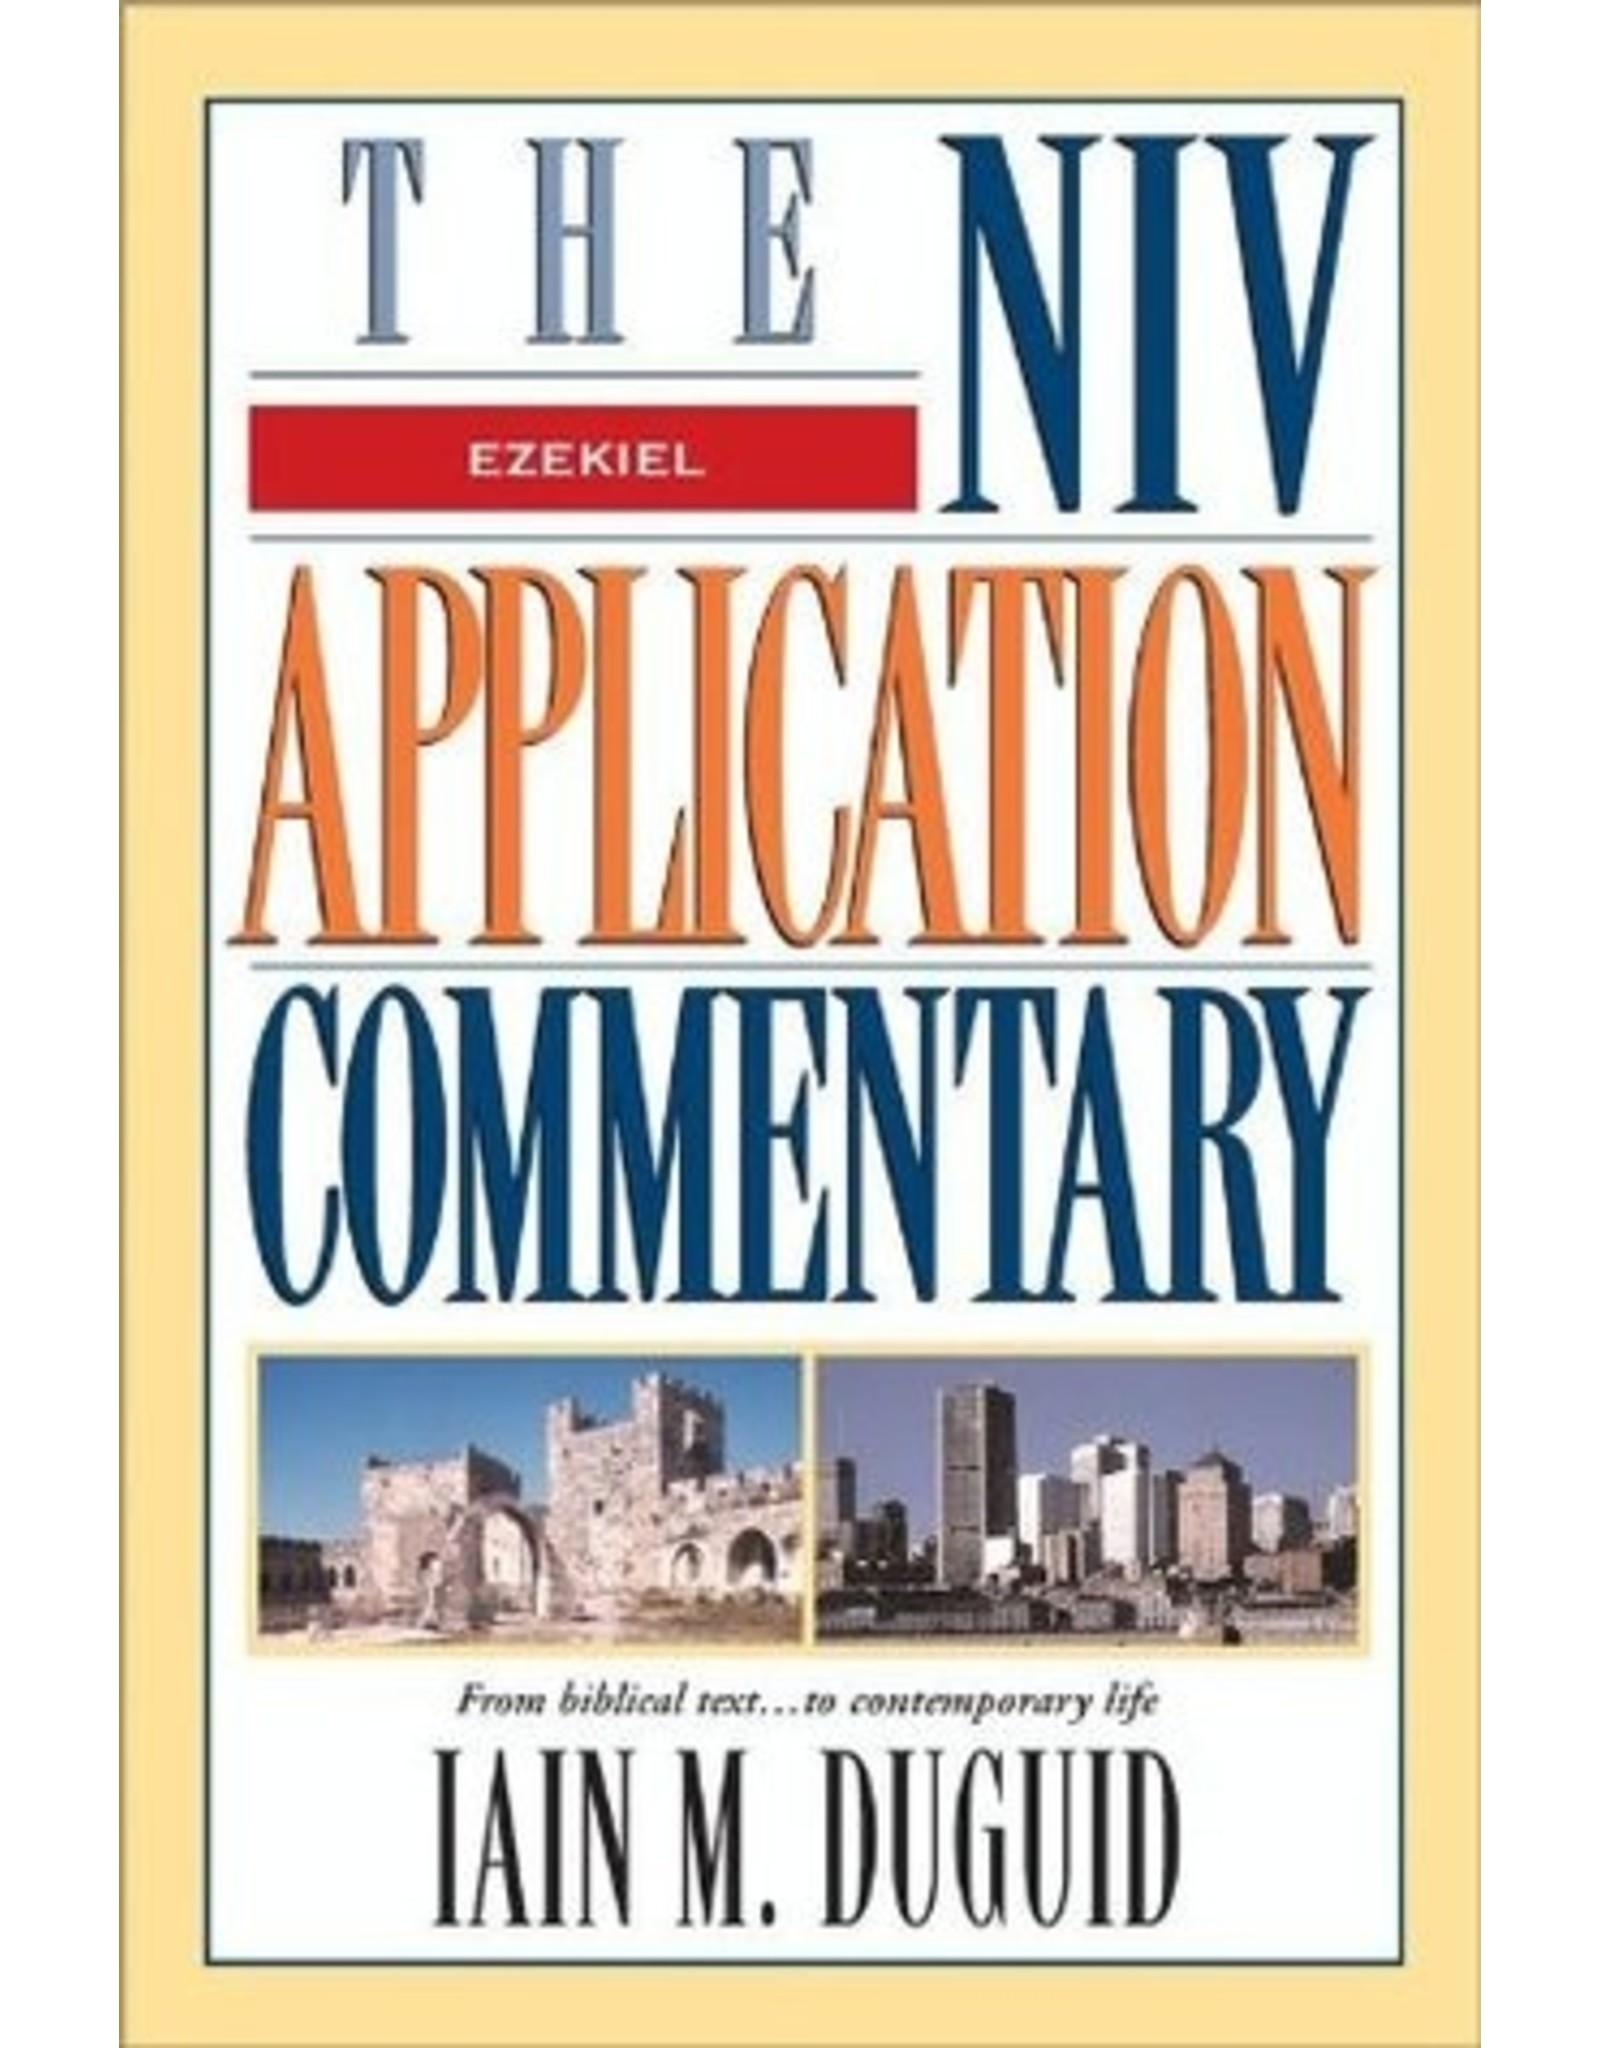 Duguid NIV Application Commentary - Ezekiel